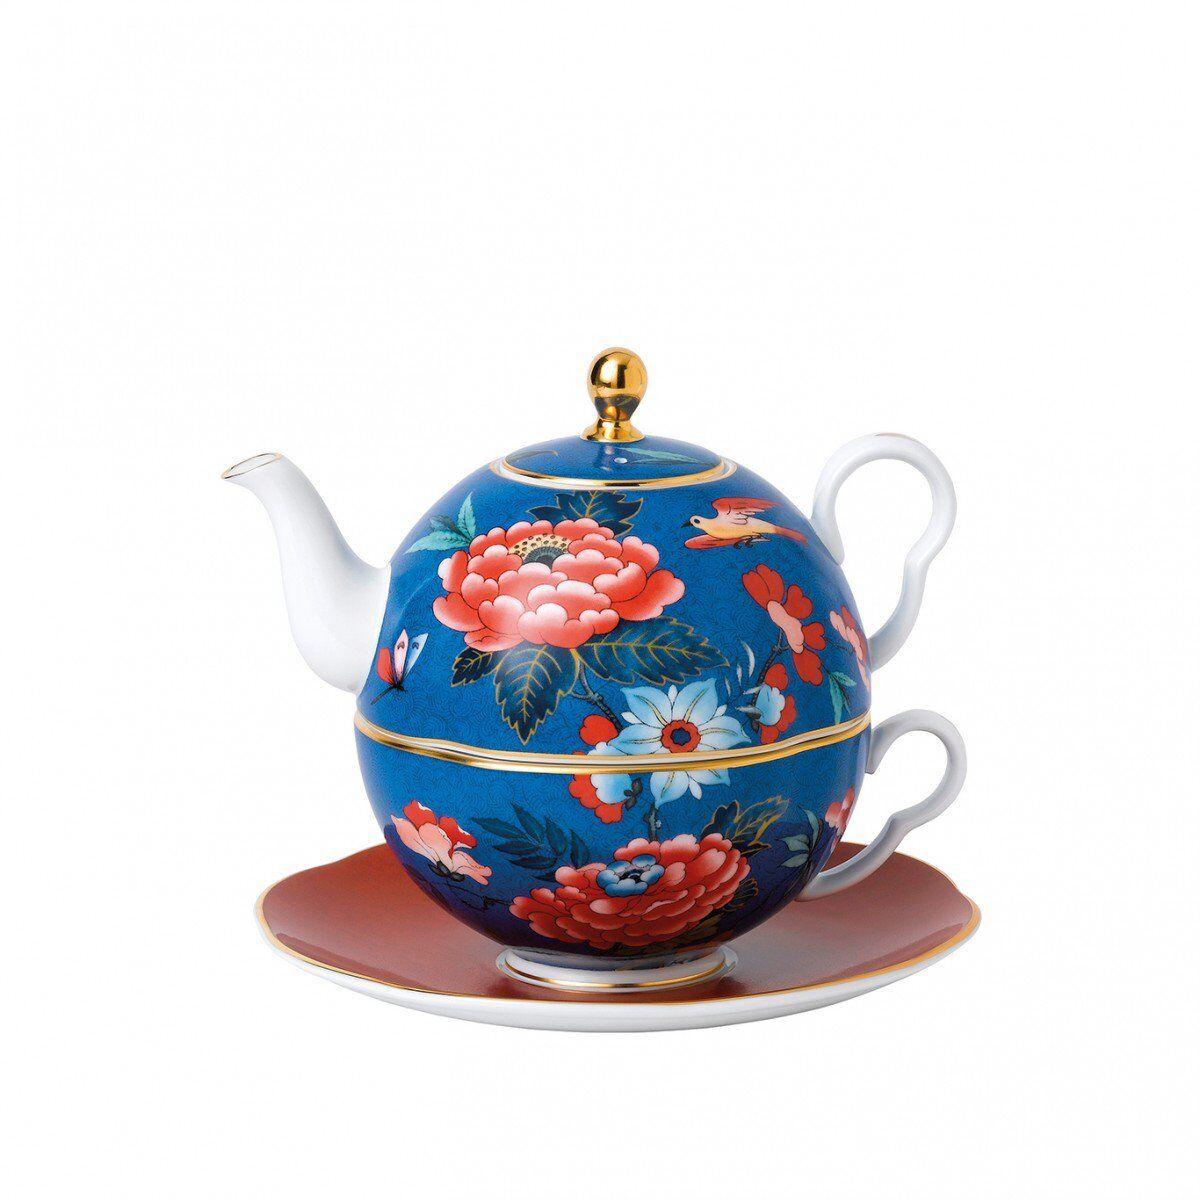 Wedgwood Paeonia bleush bleu & rouge Tea for one